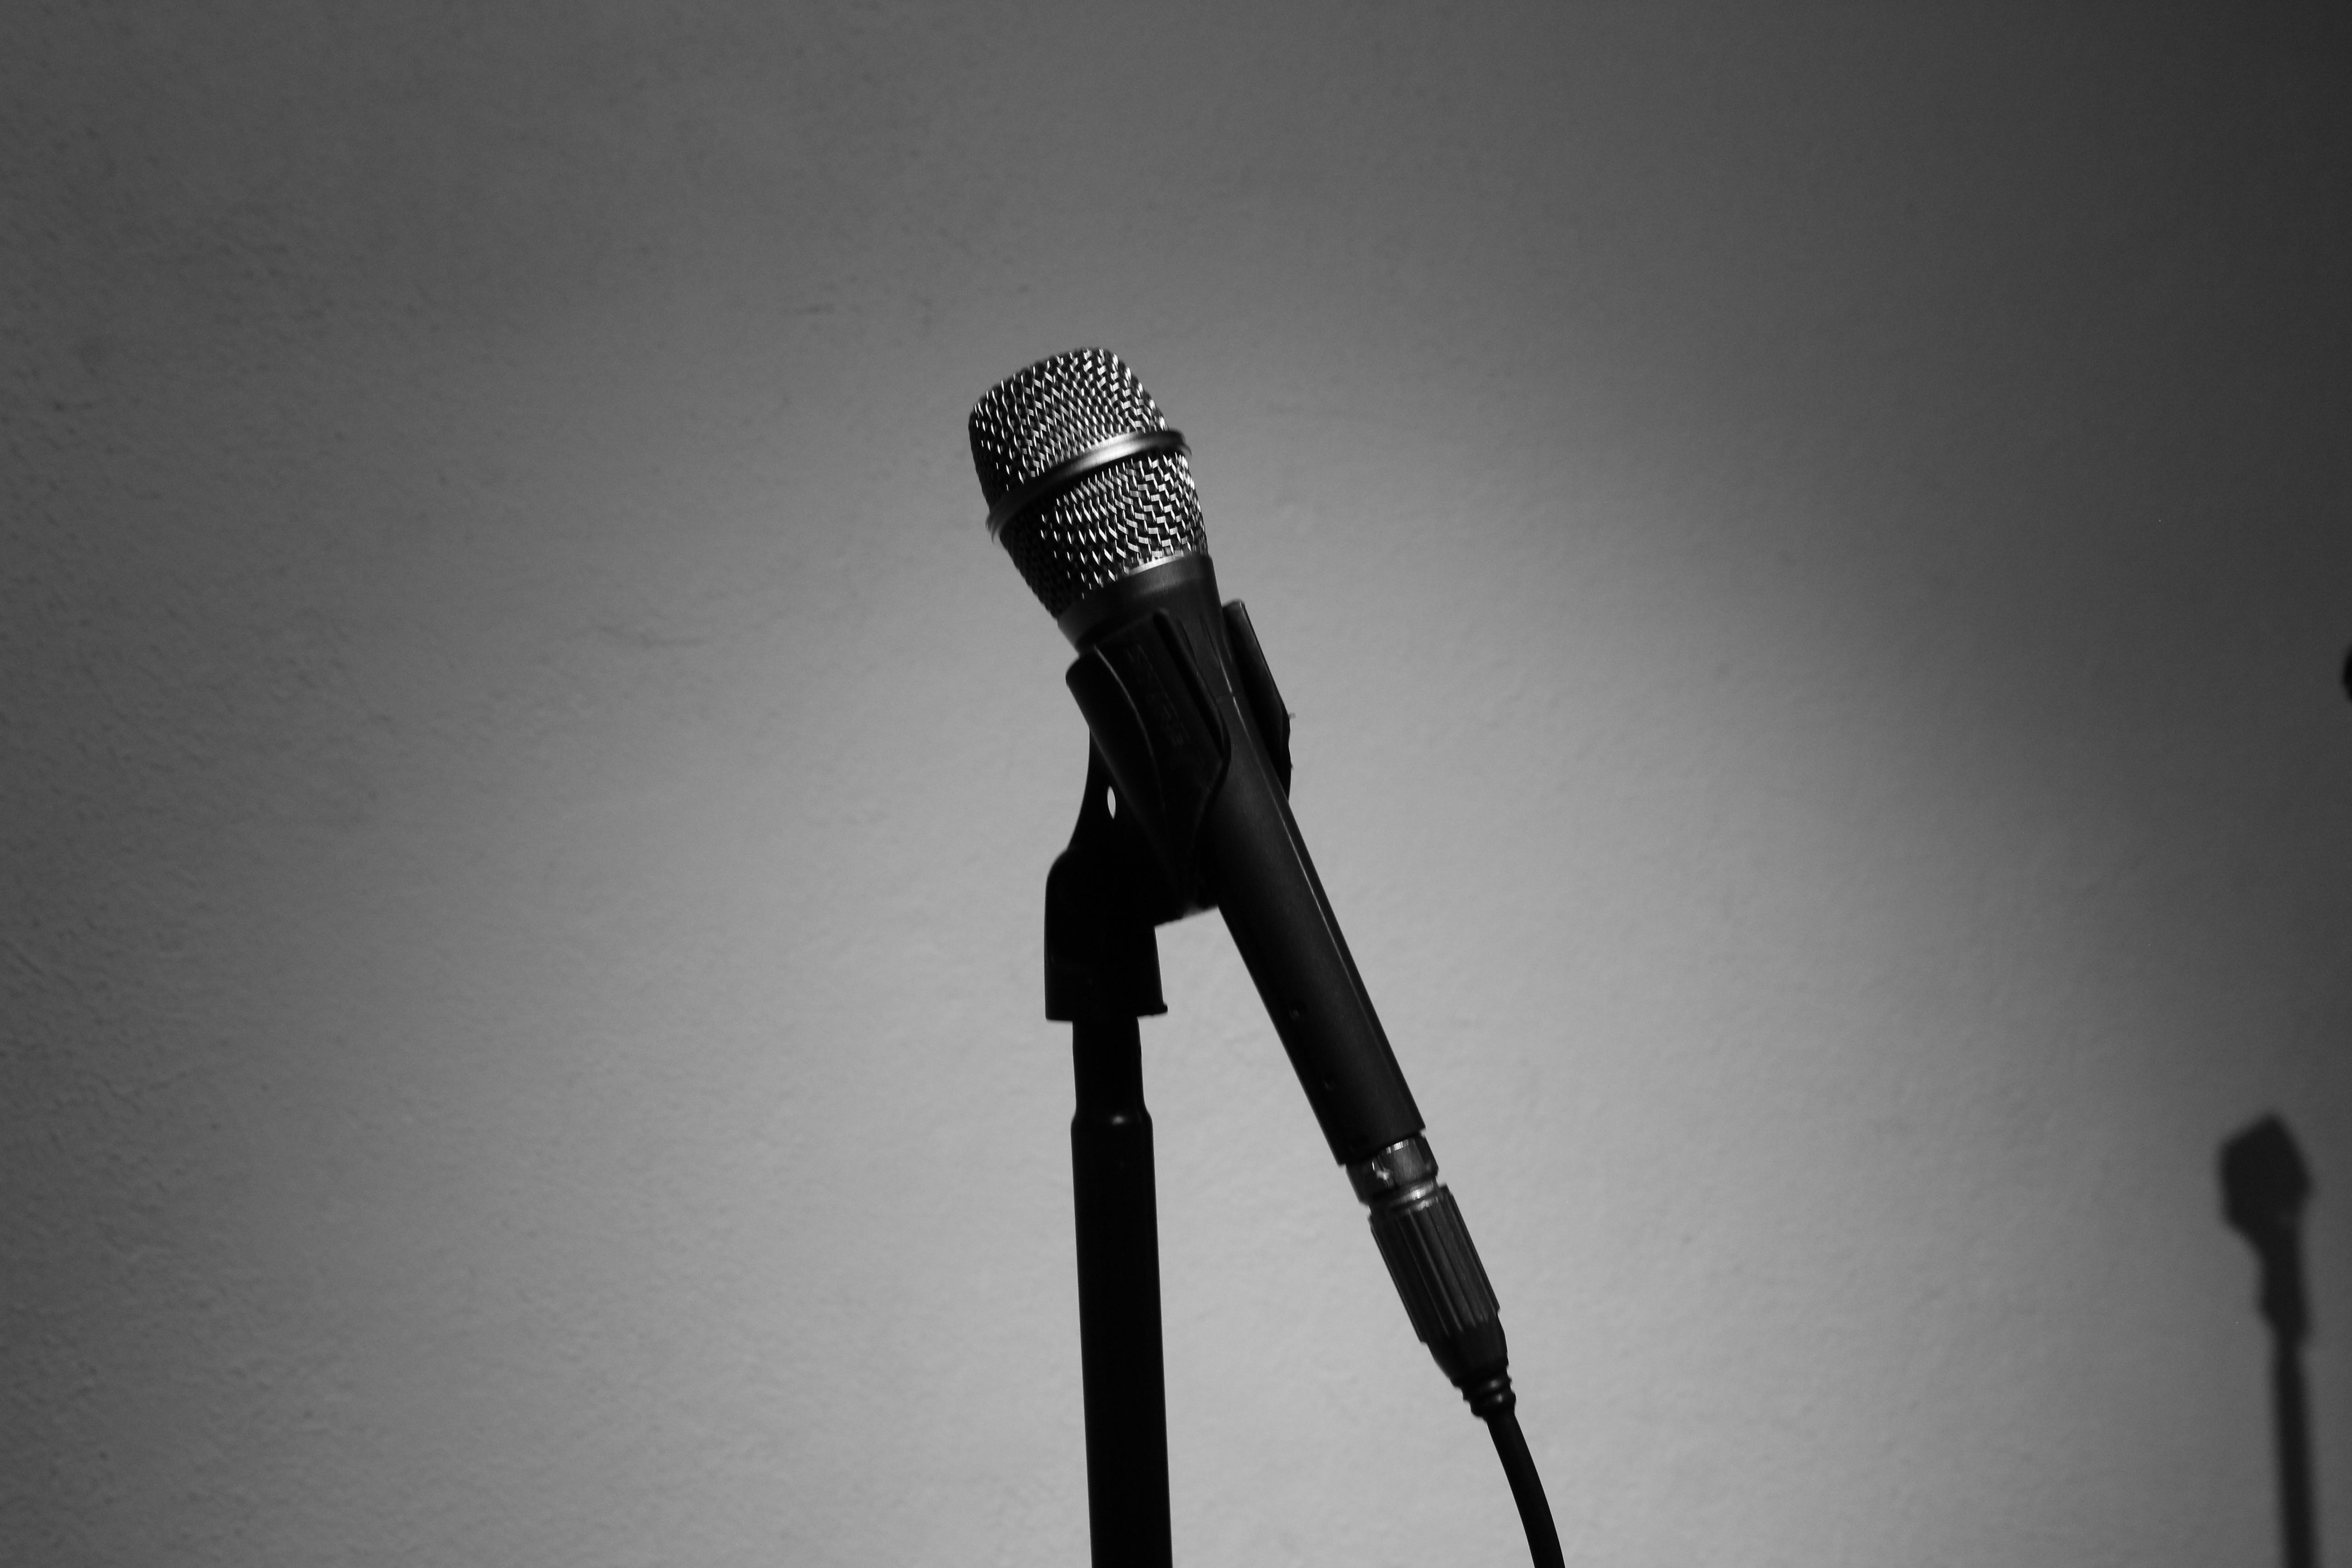 Music Light Black And White Photography Microphone Recording Studio Darkness Monochrome Lighting Art Singing